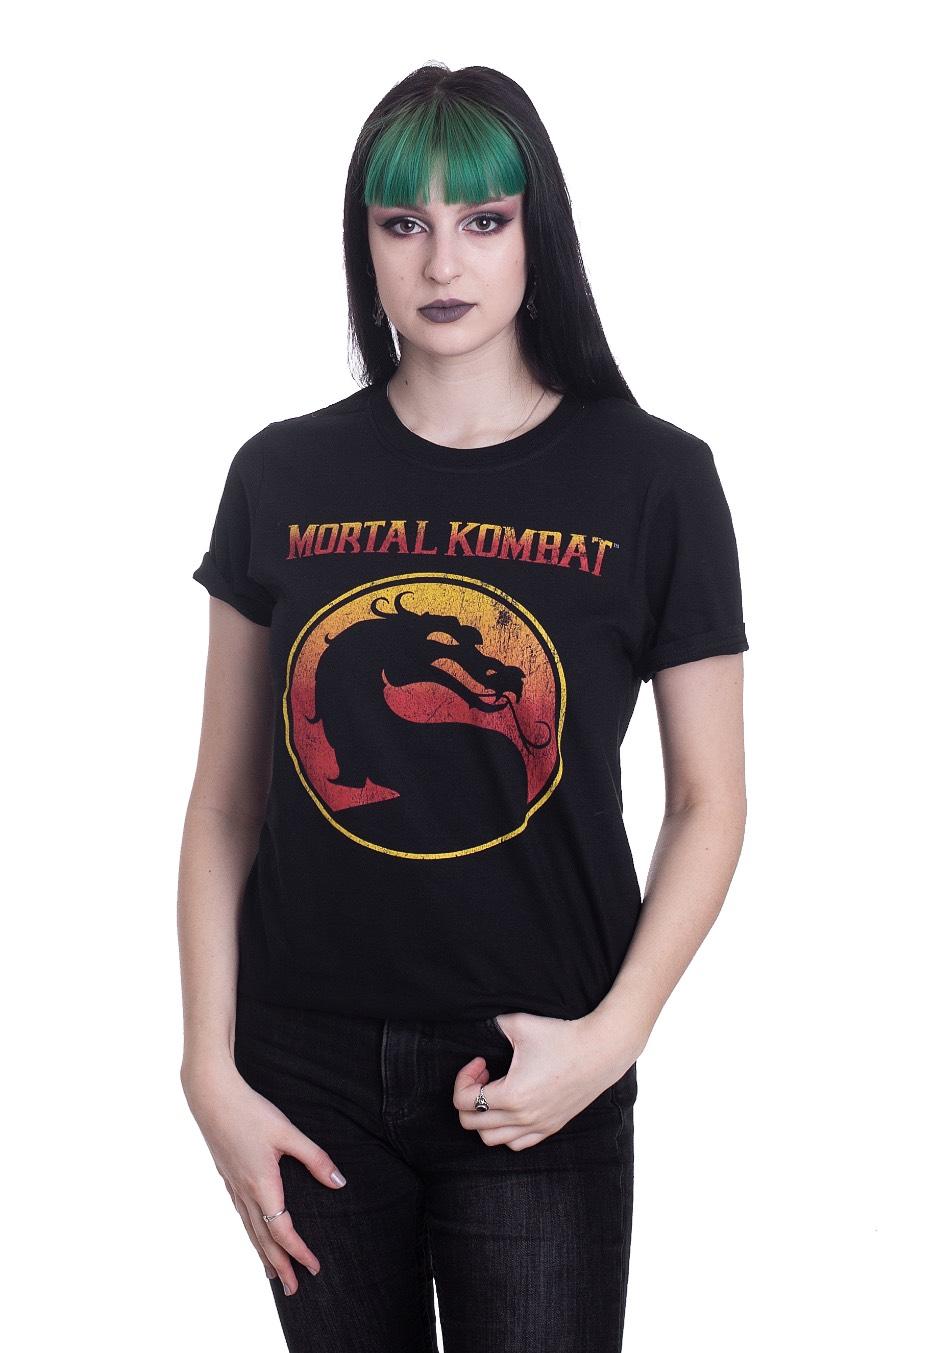 Mortal Kombat Logo T Shirt Impericon Com Worldwide